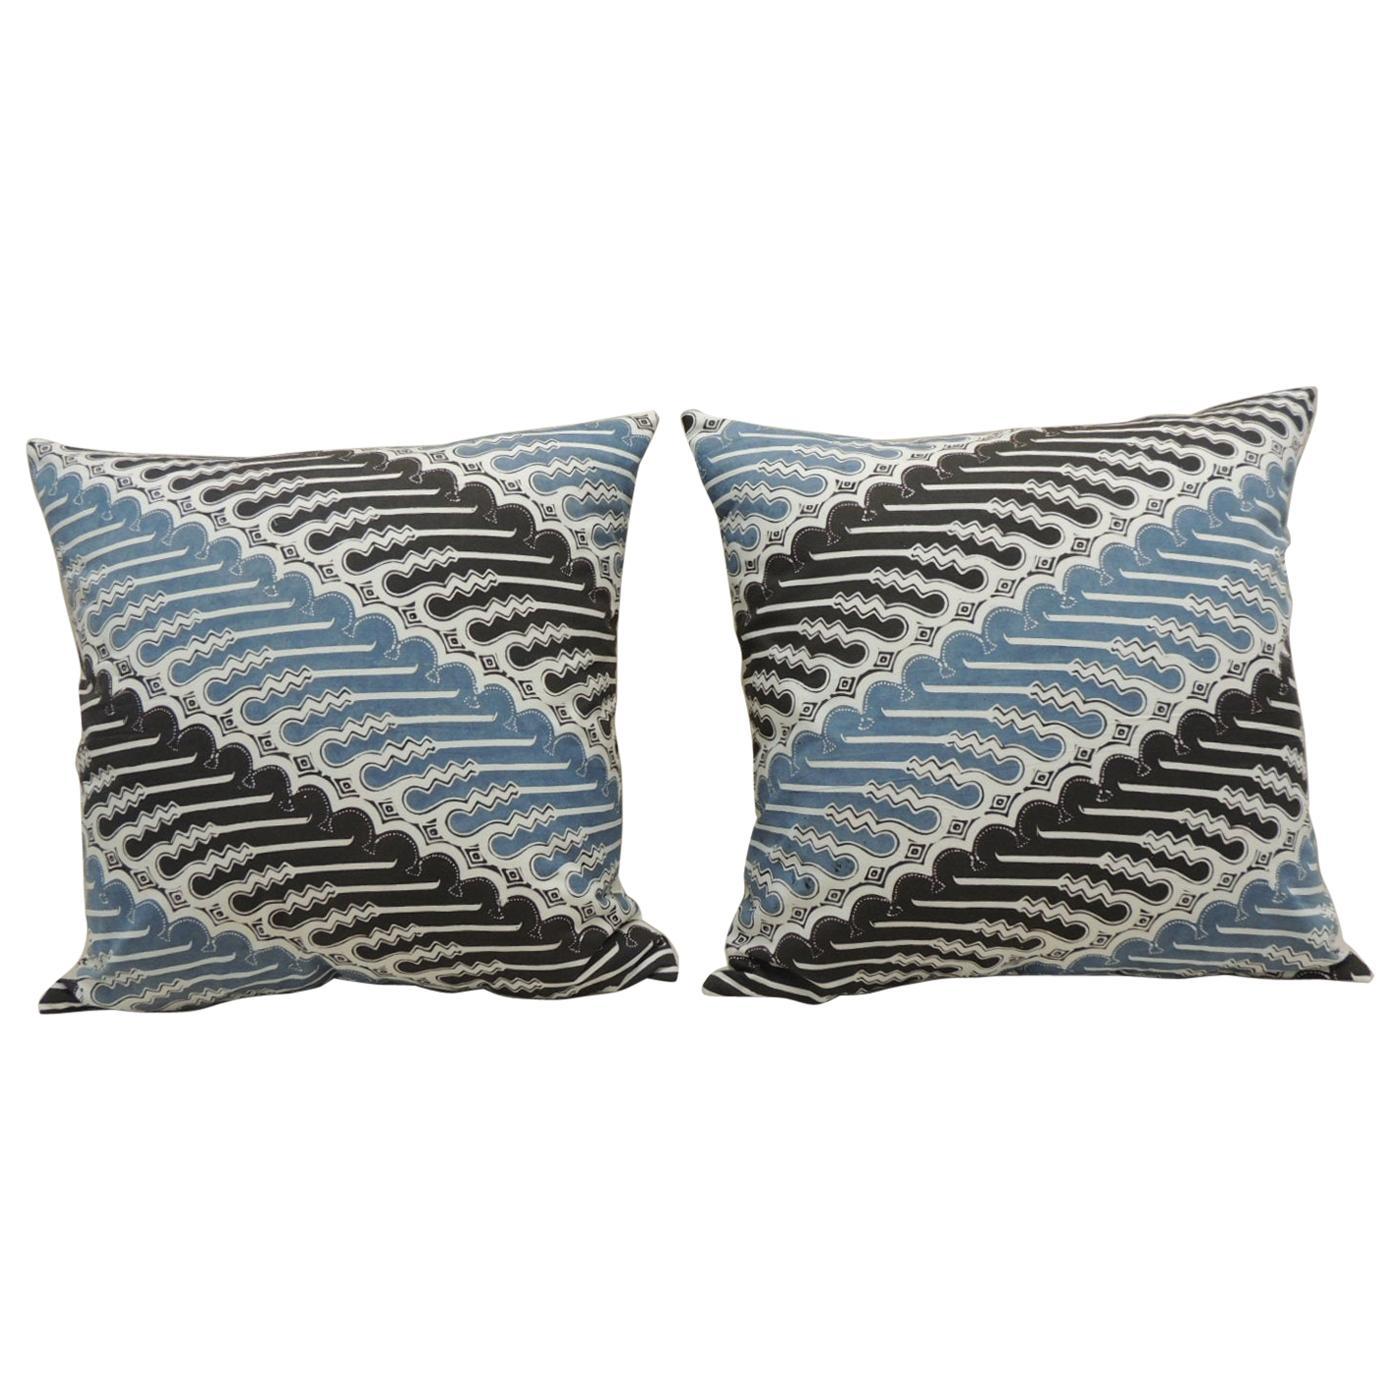 Pair of Vintage Blue and Black Hand-Blocked Batik Decorative Square Pillows